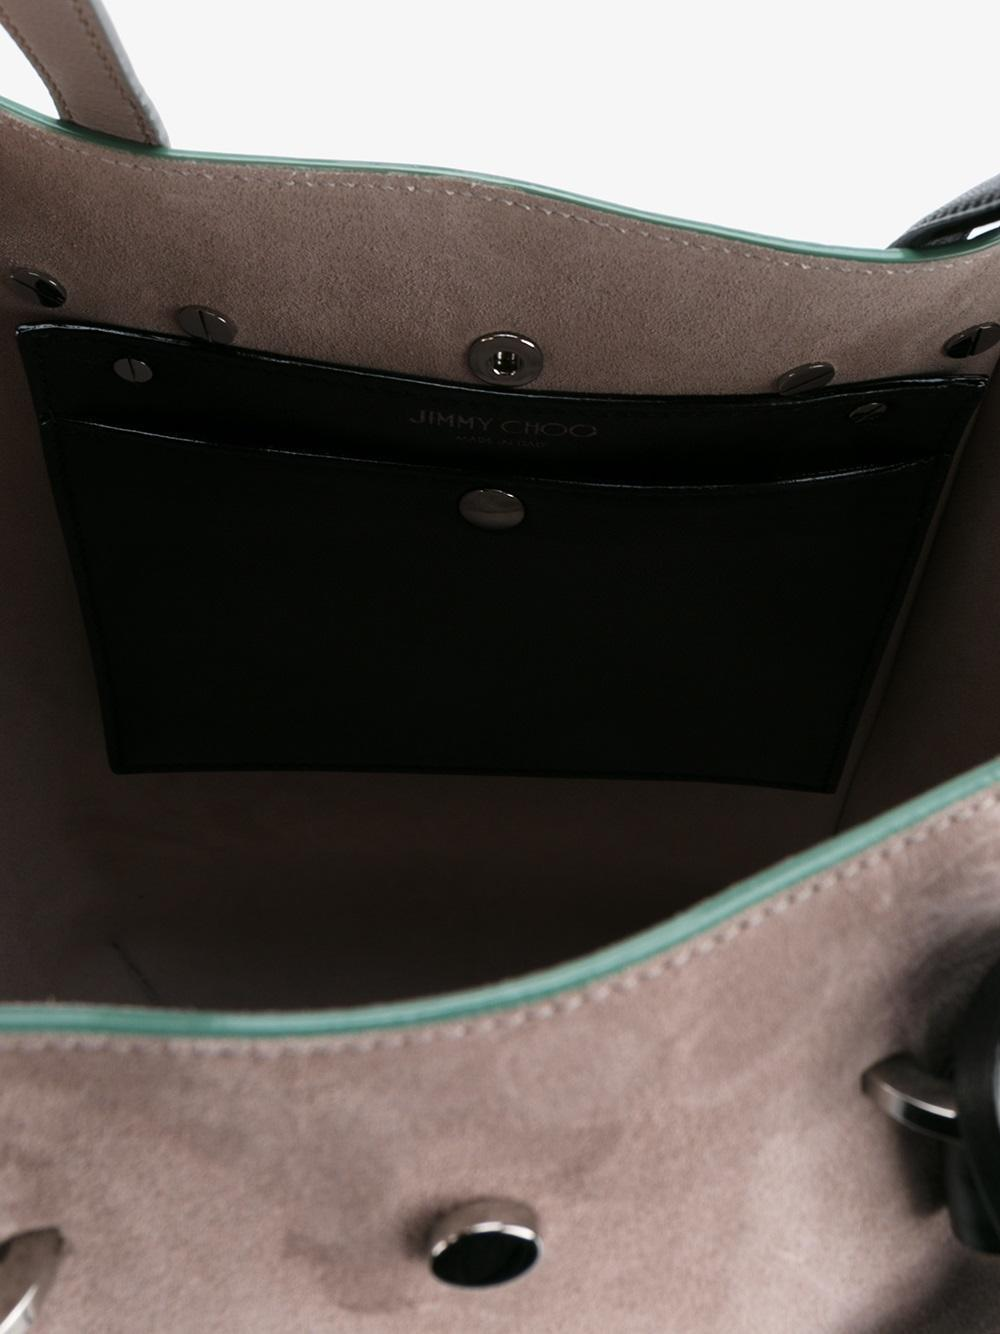 Jimmy Choo Leather Twist Tote Bag in Grey (Grey)